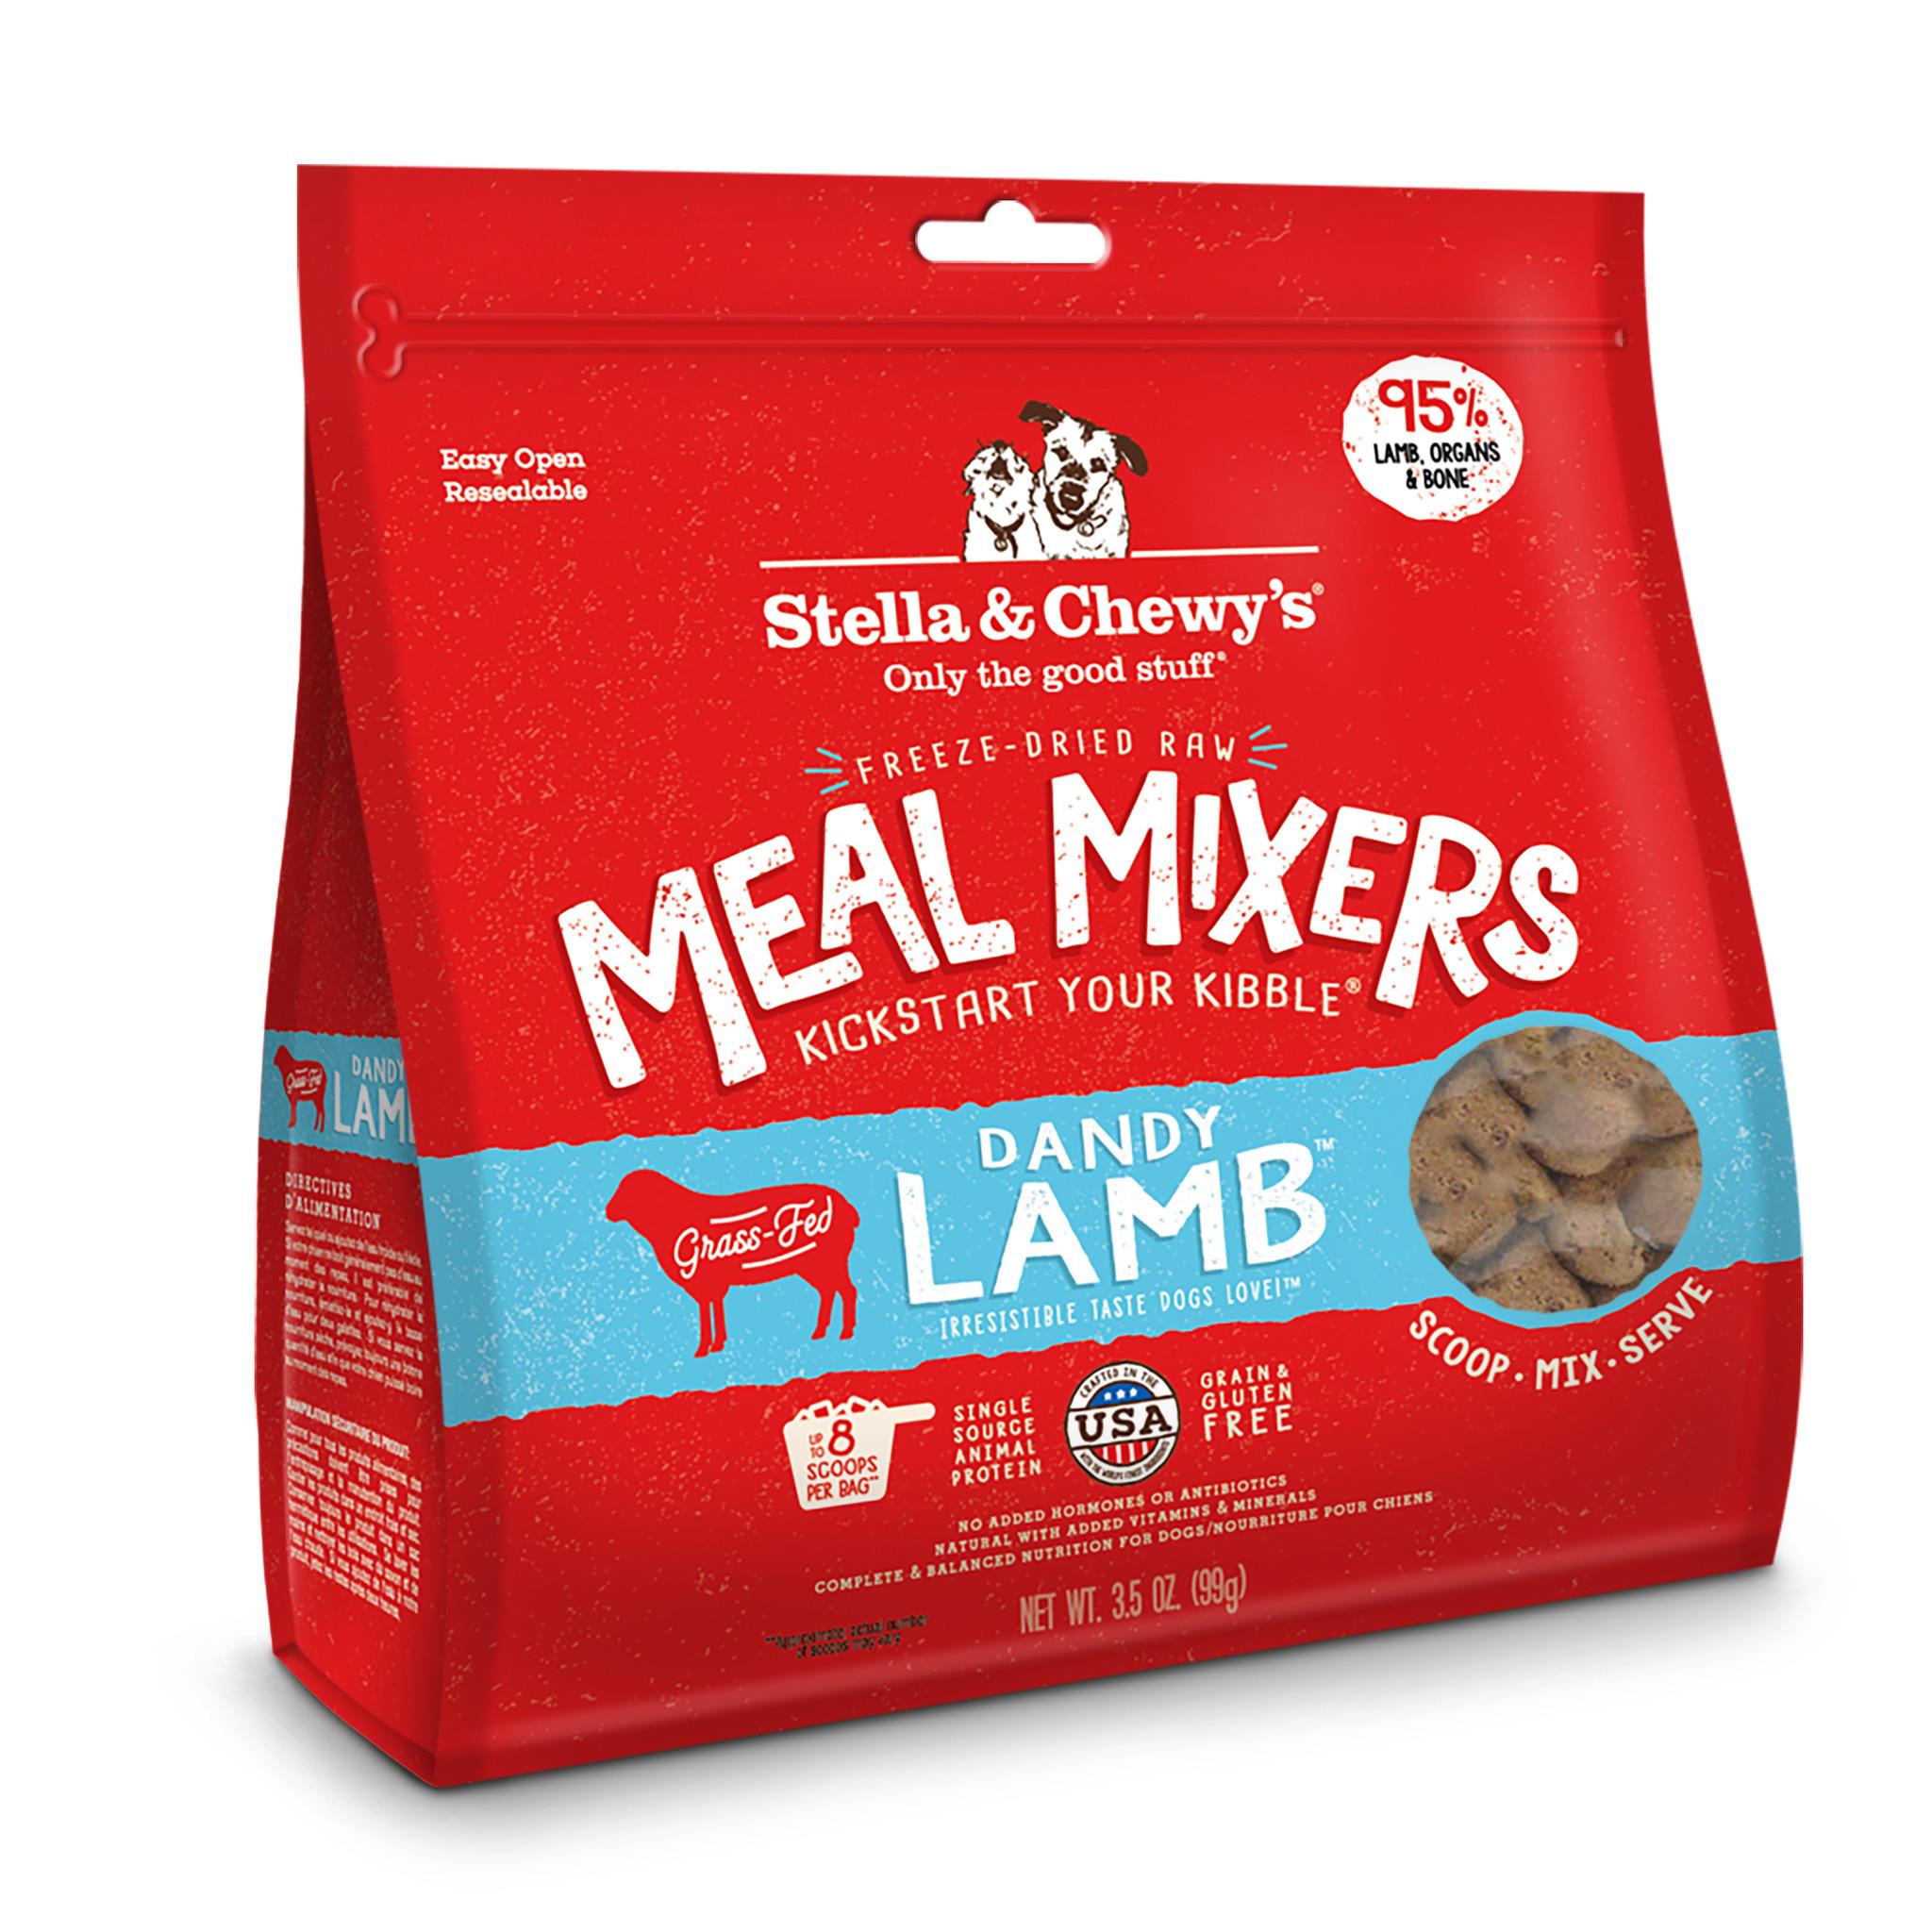 Stella & Chewys Stella & Chewys Dandy Lamb Meal Mixer